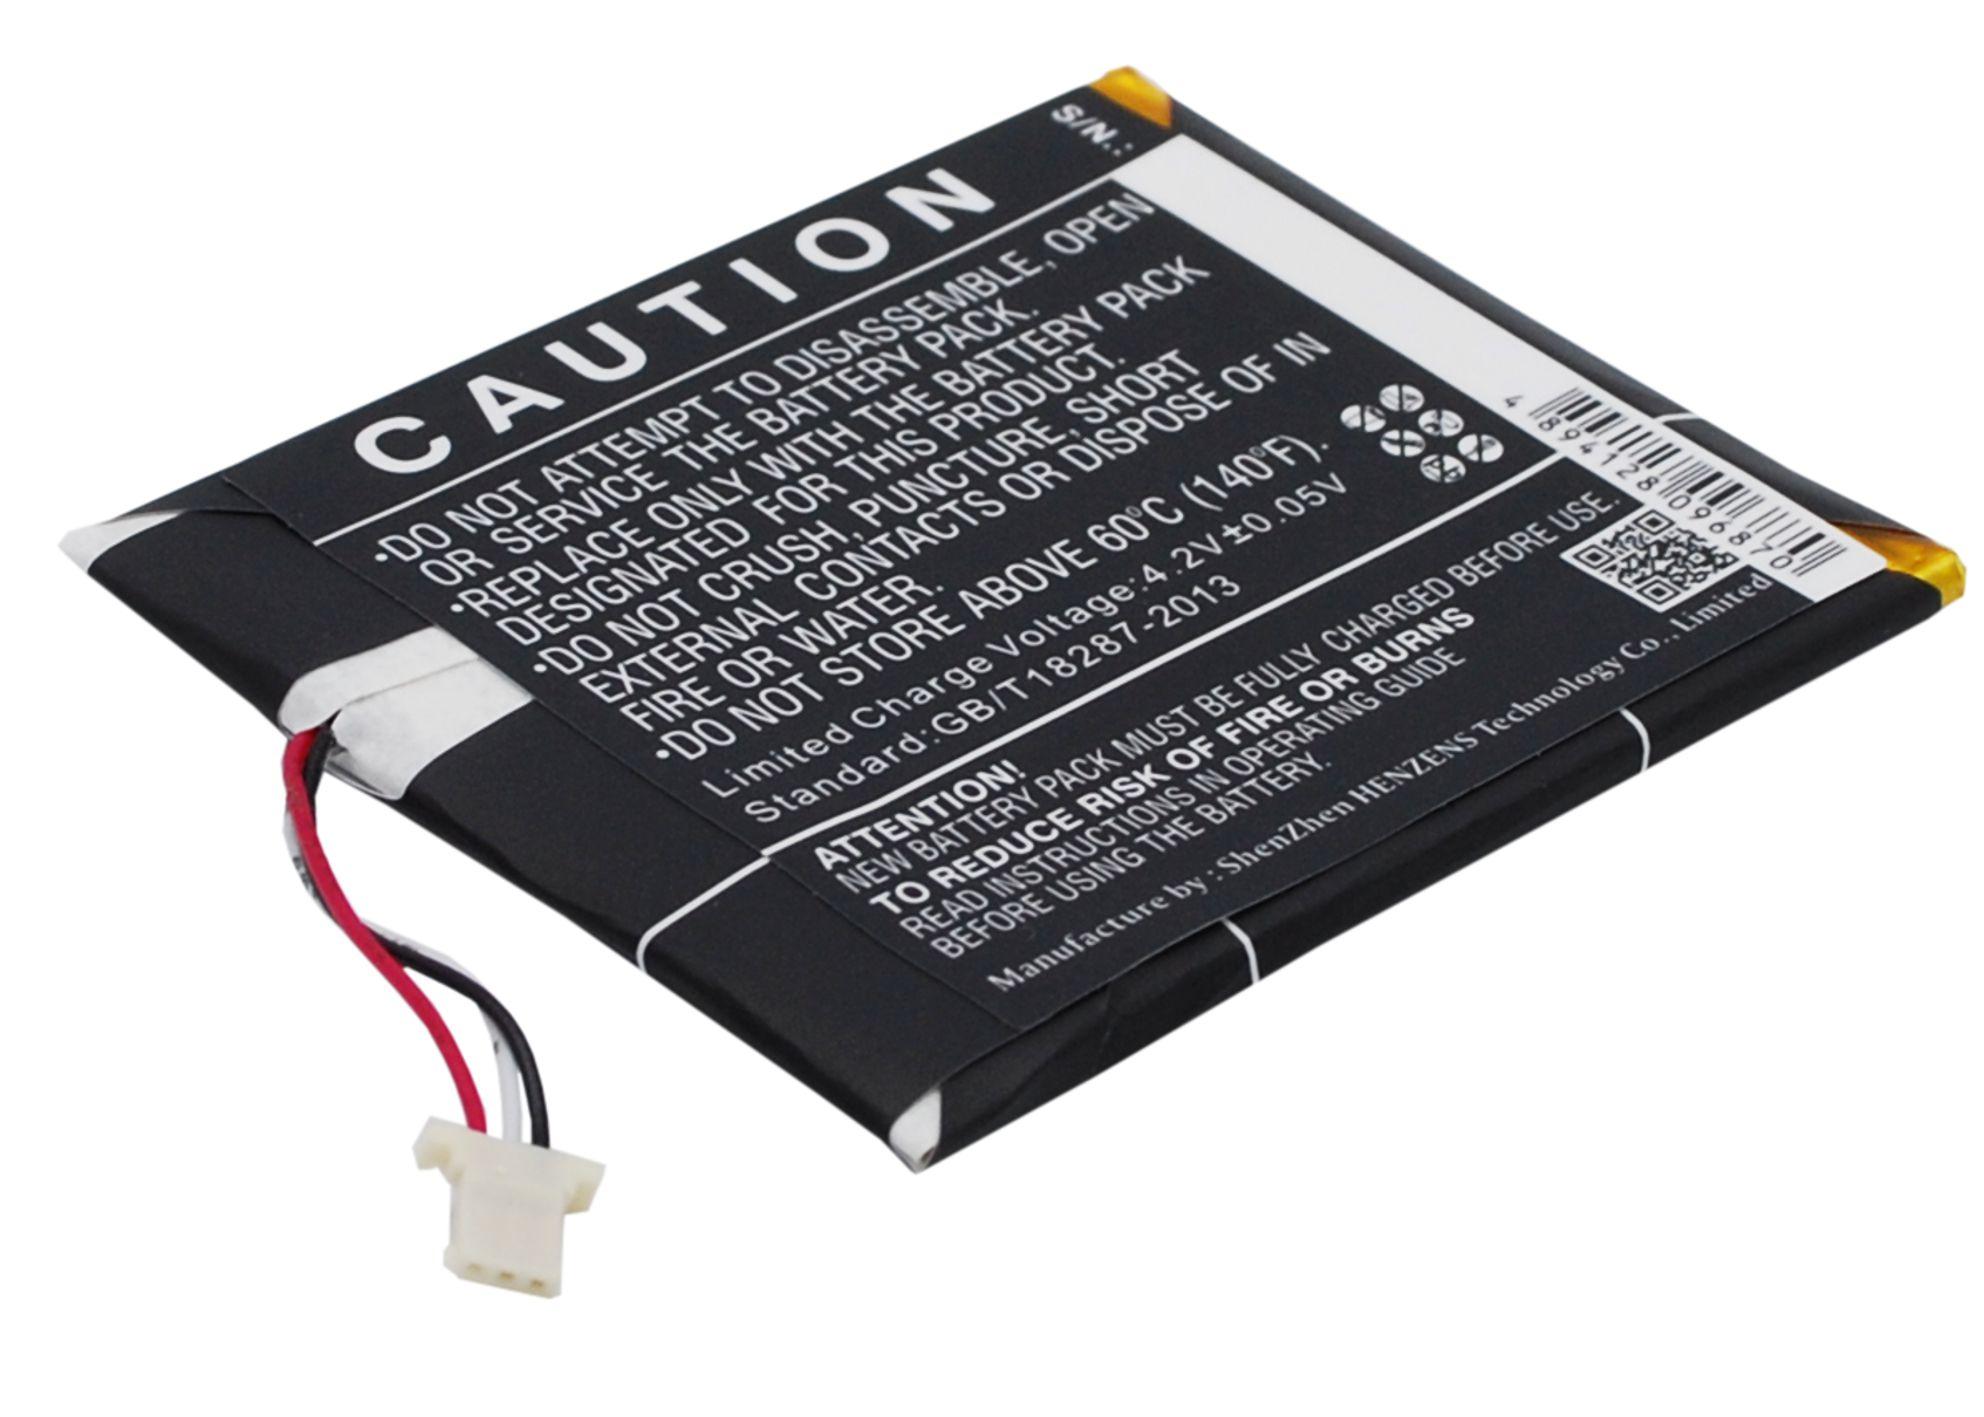 Akku Batería 890mAh für 58-000083 58-000151 MC-265360-03 Bateria Battery